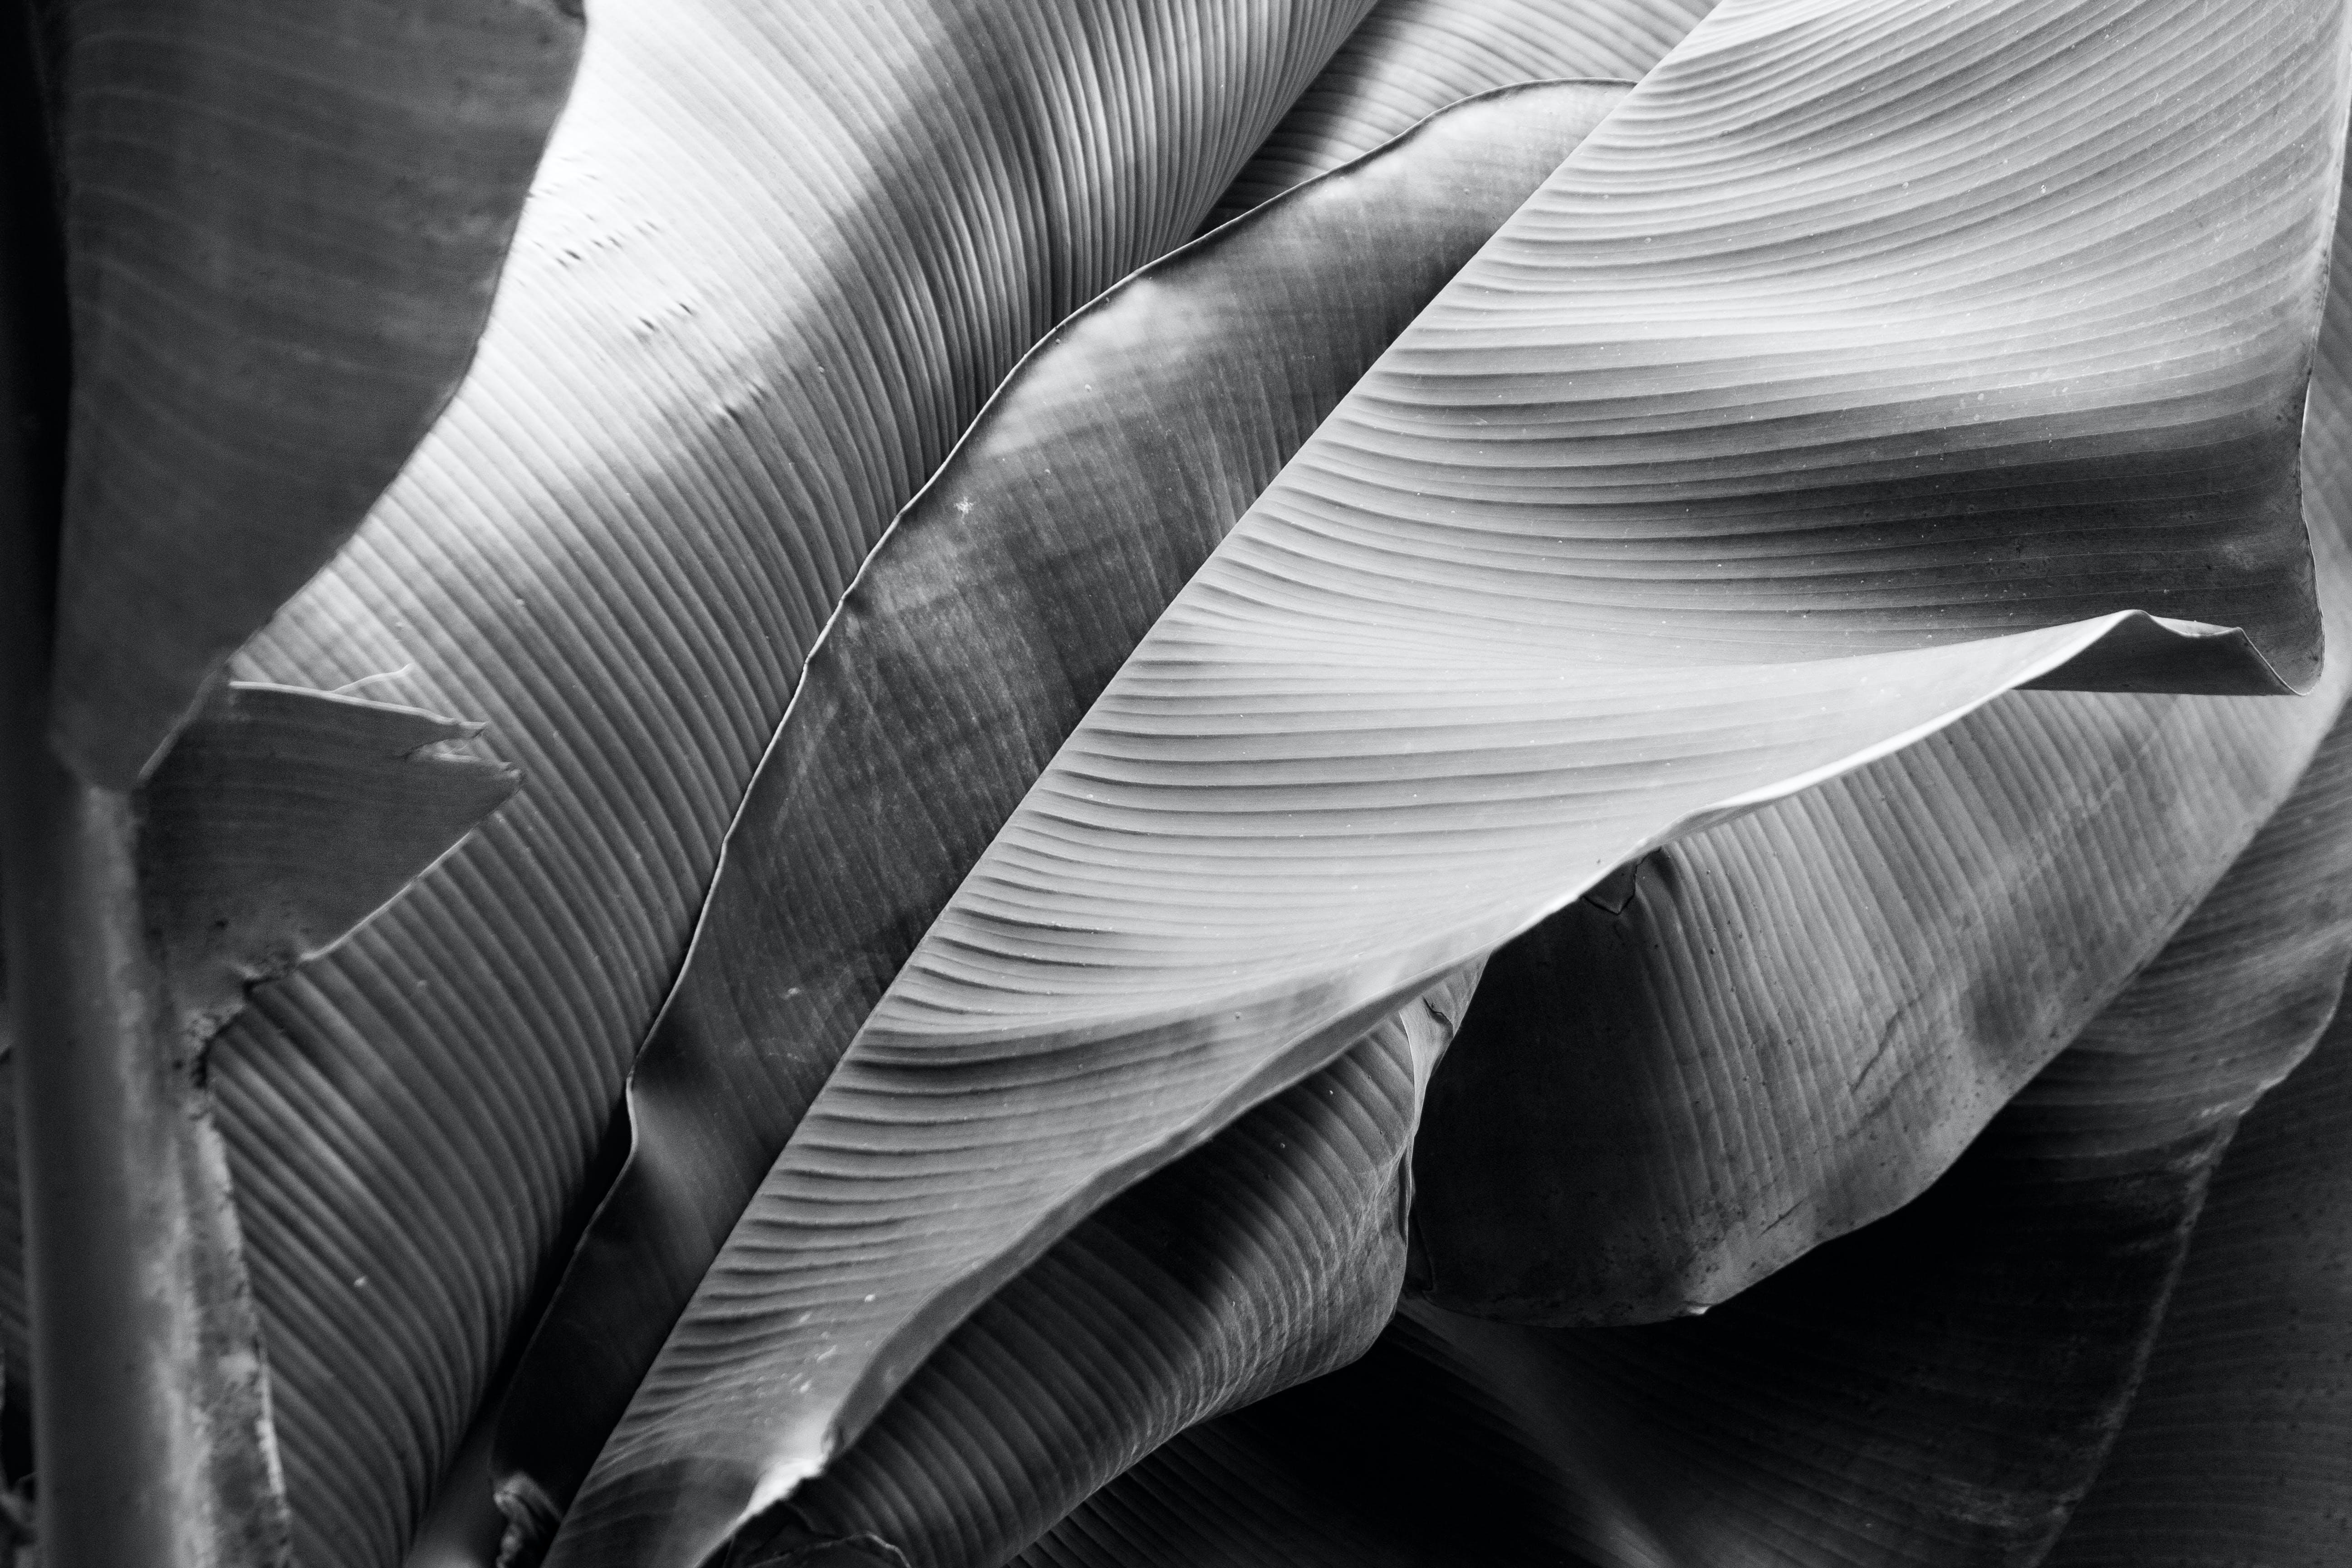 Grayscale Photo of Banana Leaf